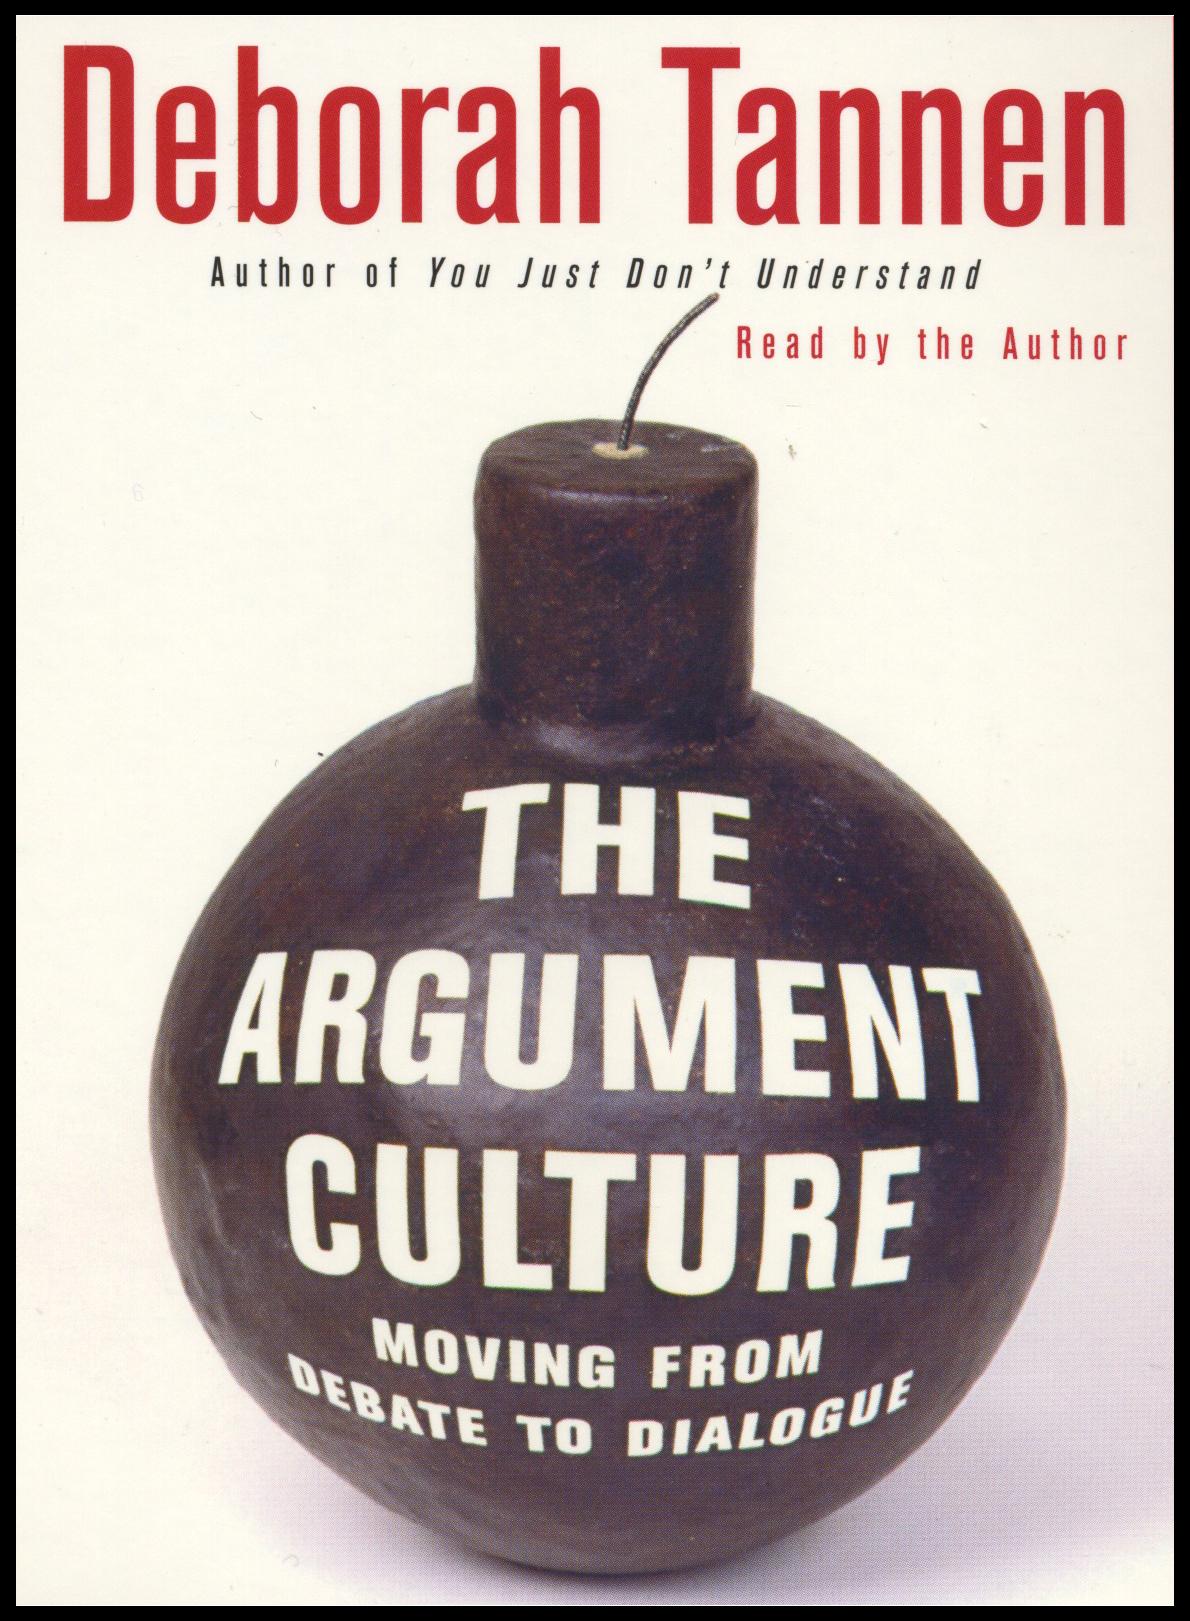 Rhetorical Analysis on Deborah Tannen's Argument Culture